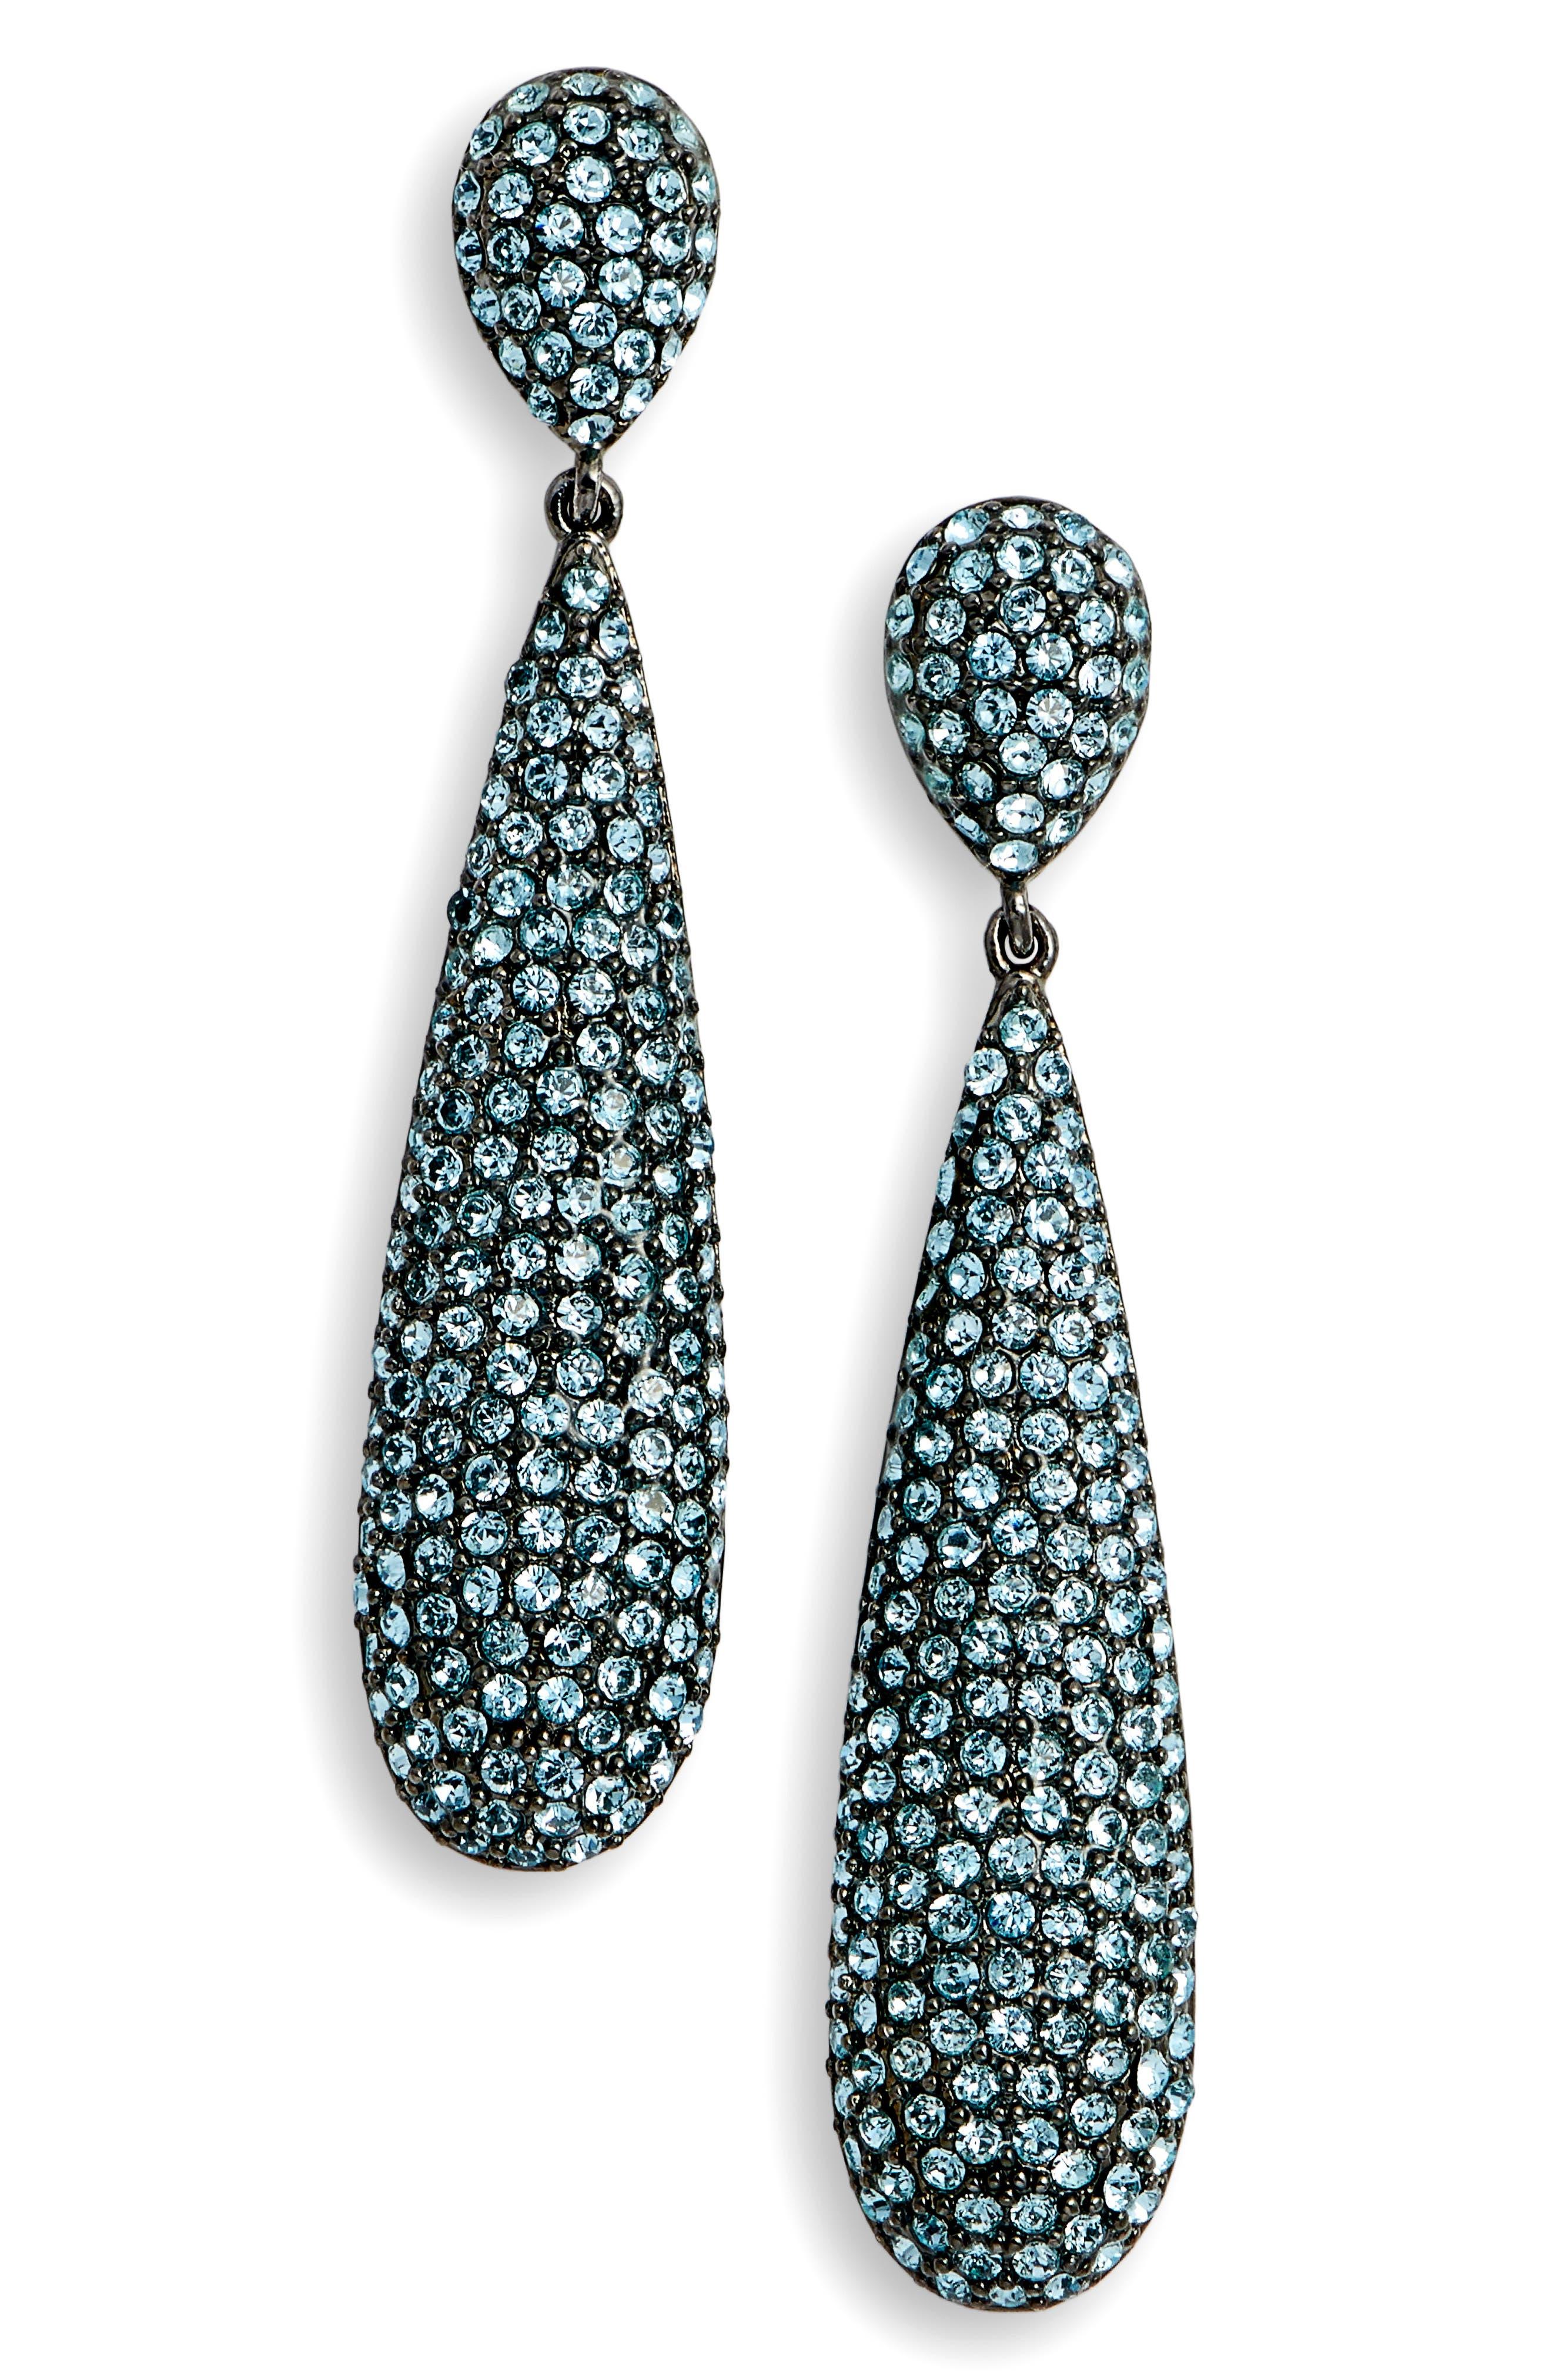 Elongated Pavé Swarovski Crystal Teardrop Earrings,                         Main,                         color, AQUAMARINE/ BLACK SILVER